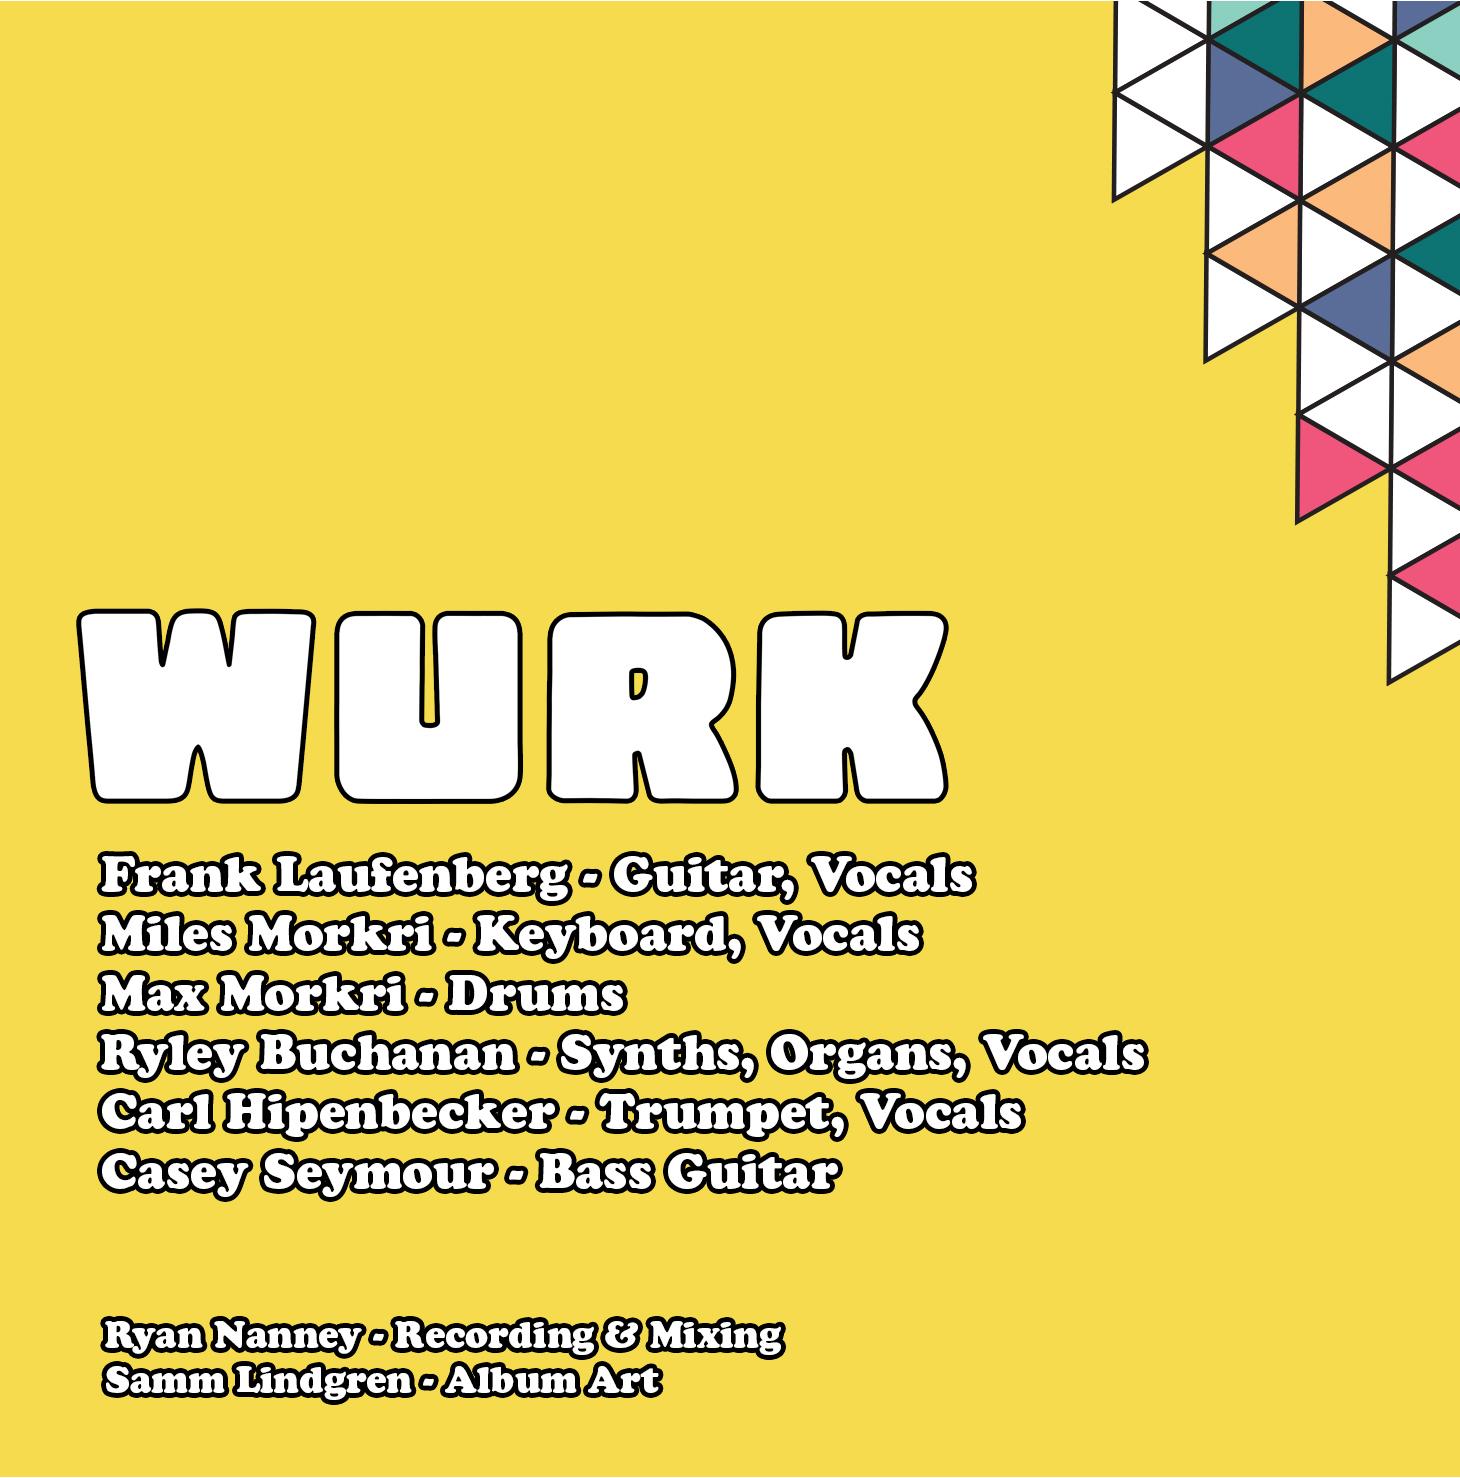 Wurk lyrics